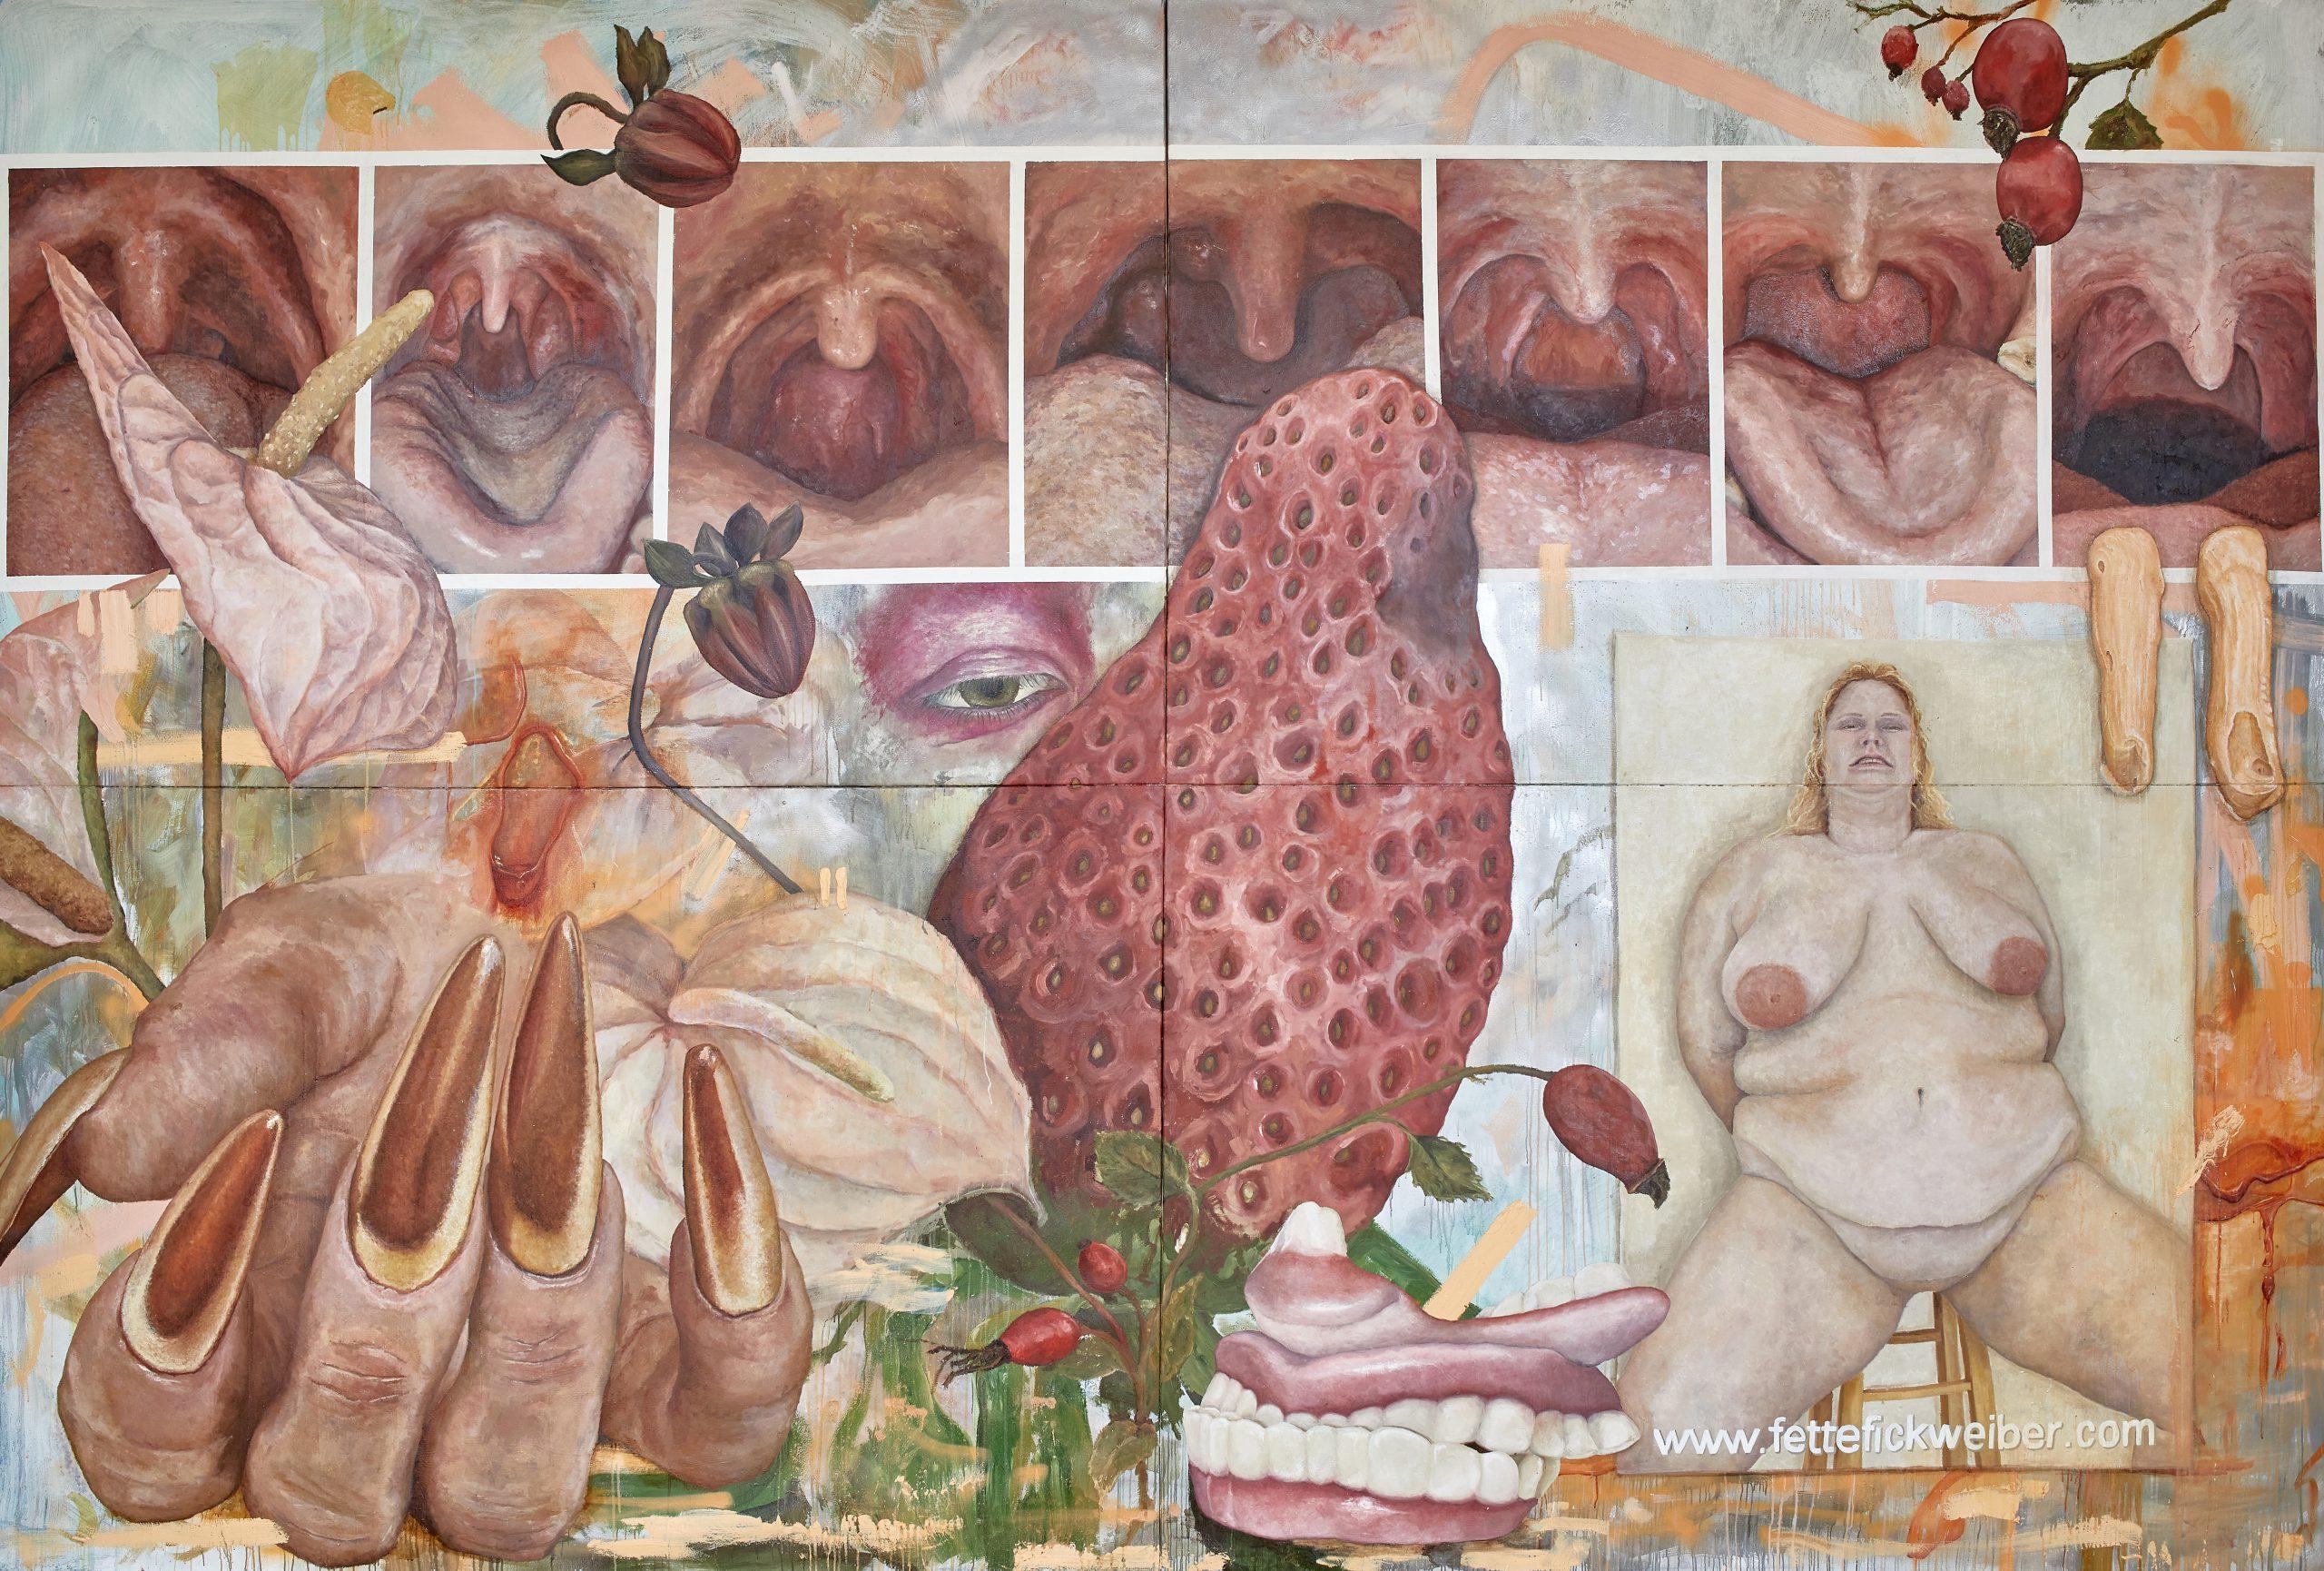 Laura Link, In Effigie www.fettefickweiber.com, 2021, Öl auf Leinwand, 340x500 cm, Foto: Thomas Lorenz